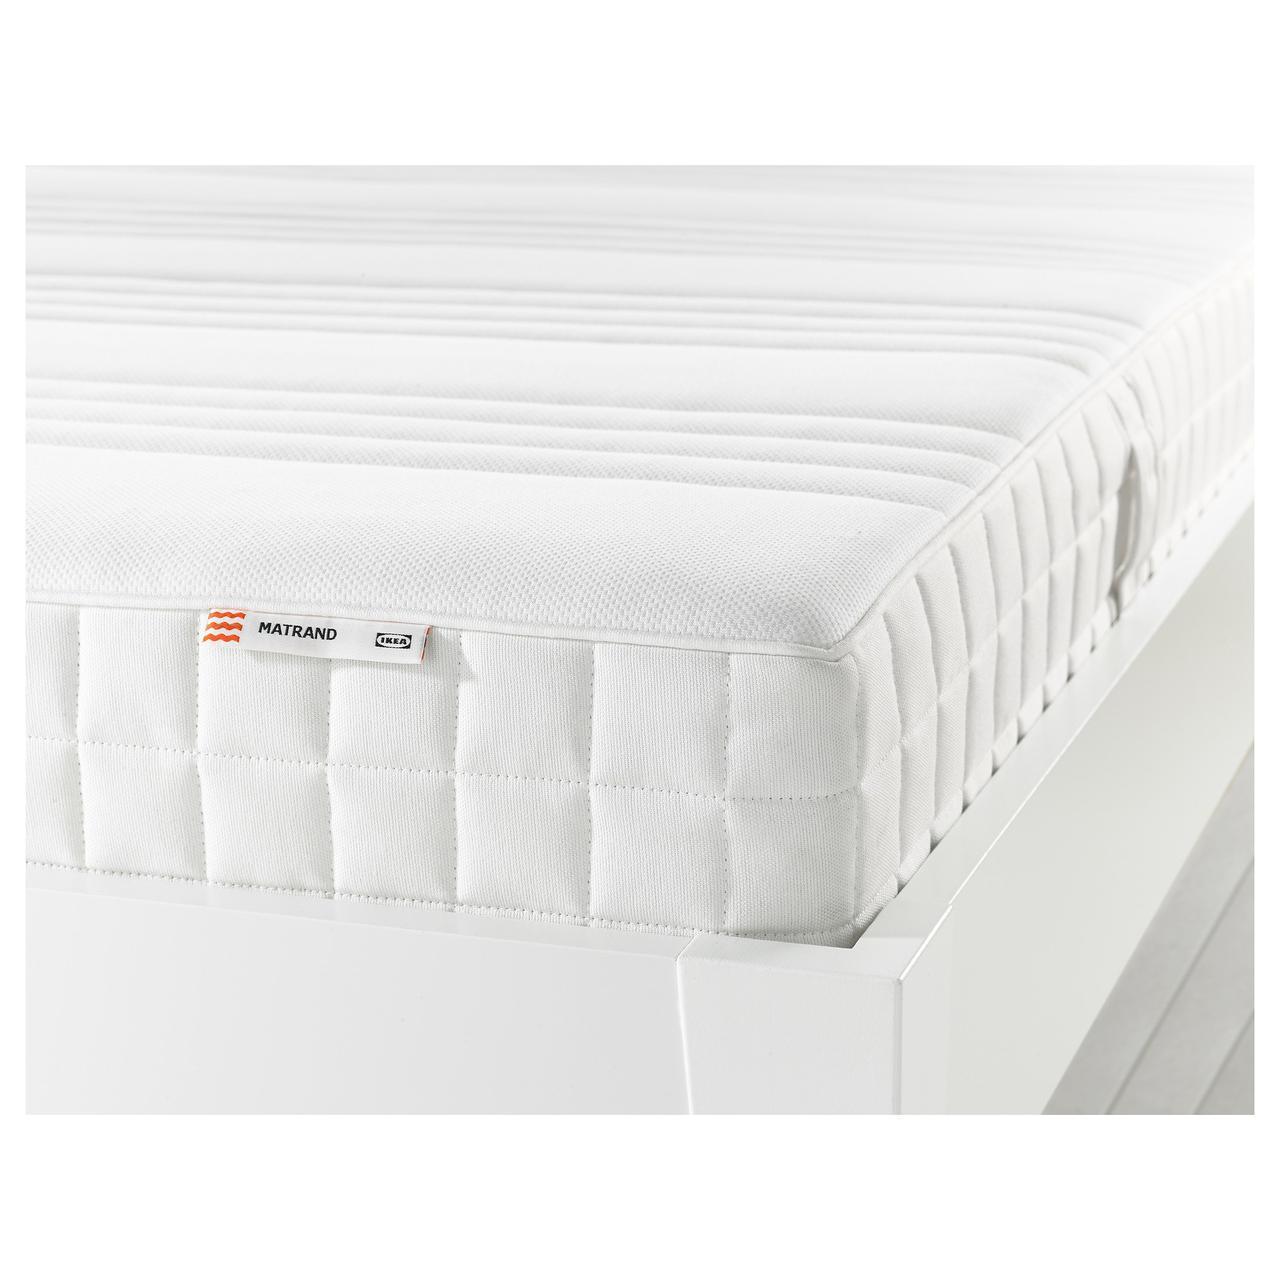 ✅ IKEA MATRAND (102.721.75) Матрас из латекса  белый